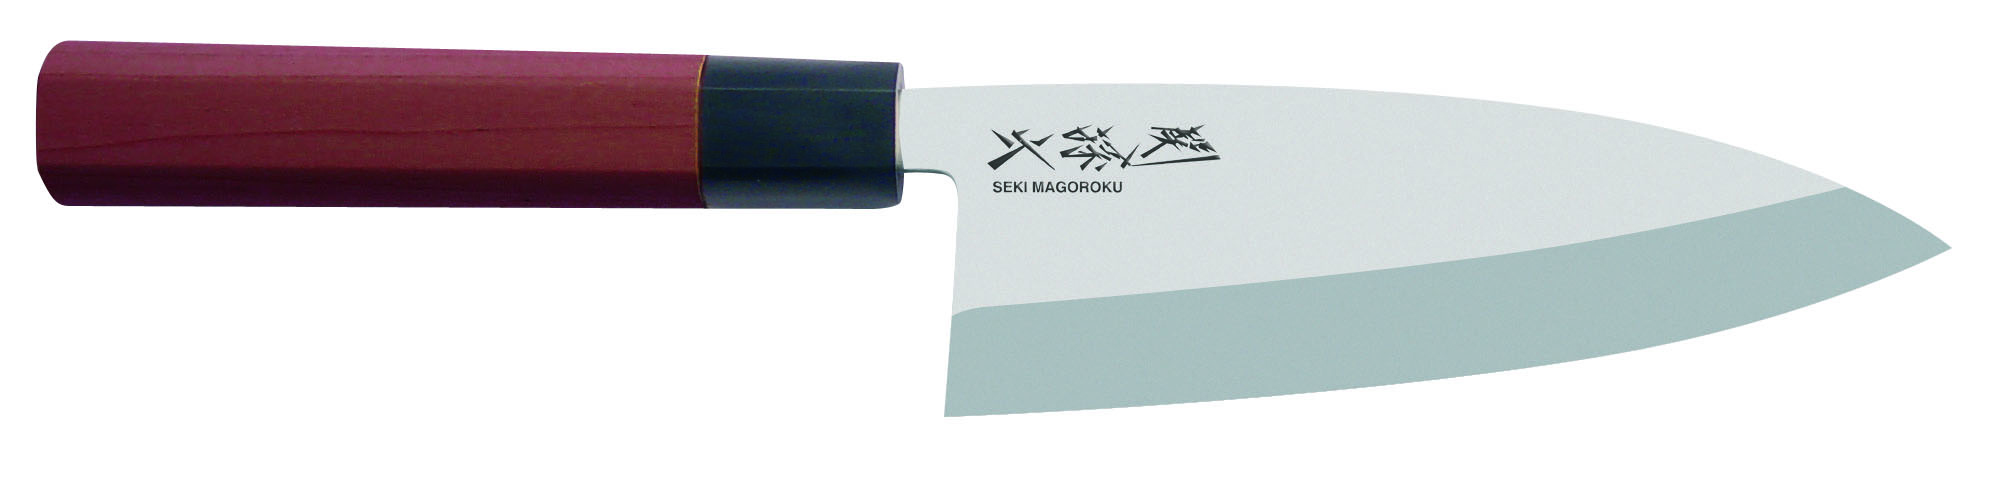 Japonský kuchynský nôž Seki Magoroku Deba MGR-155D